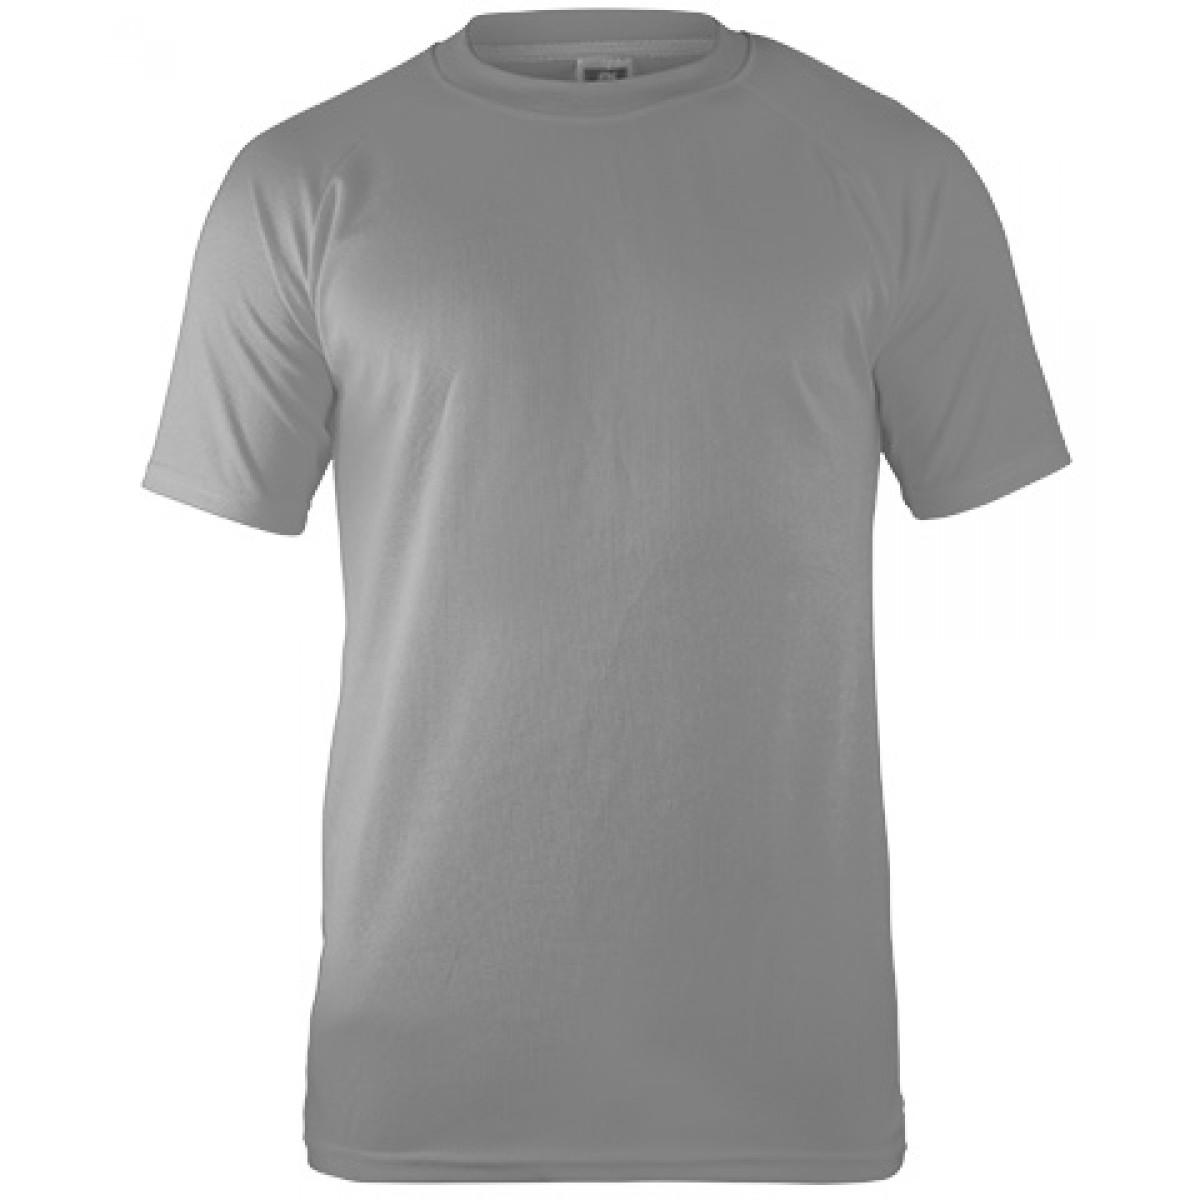 Performance T-shirt-Gray -XS